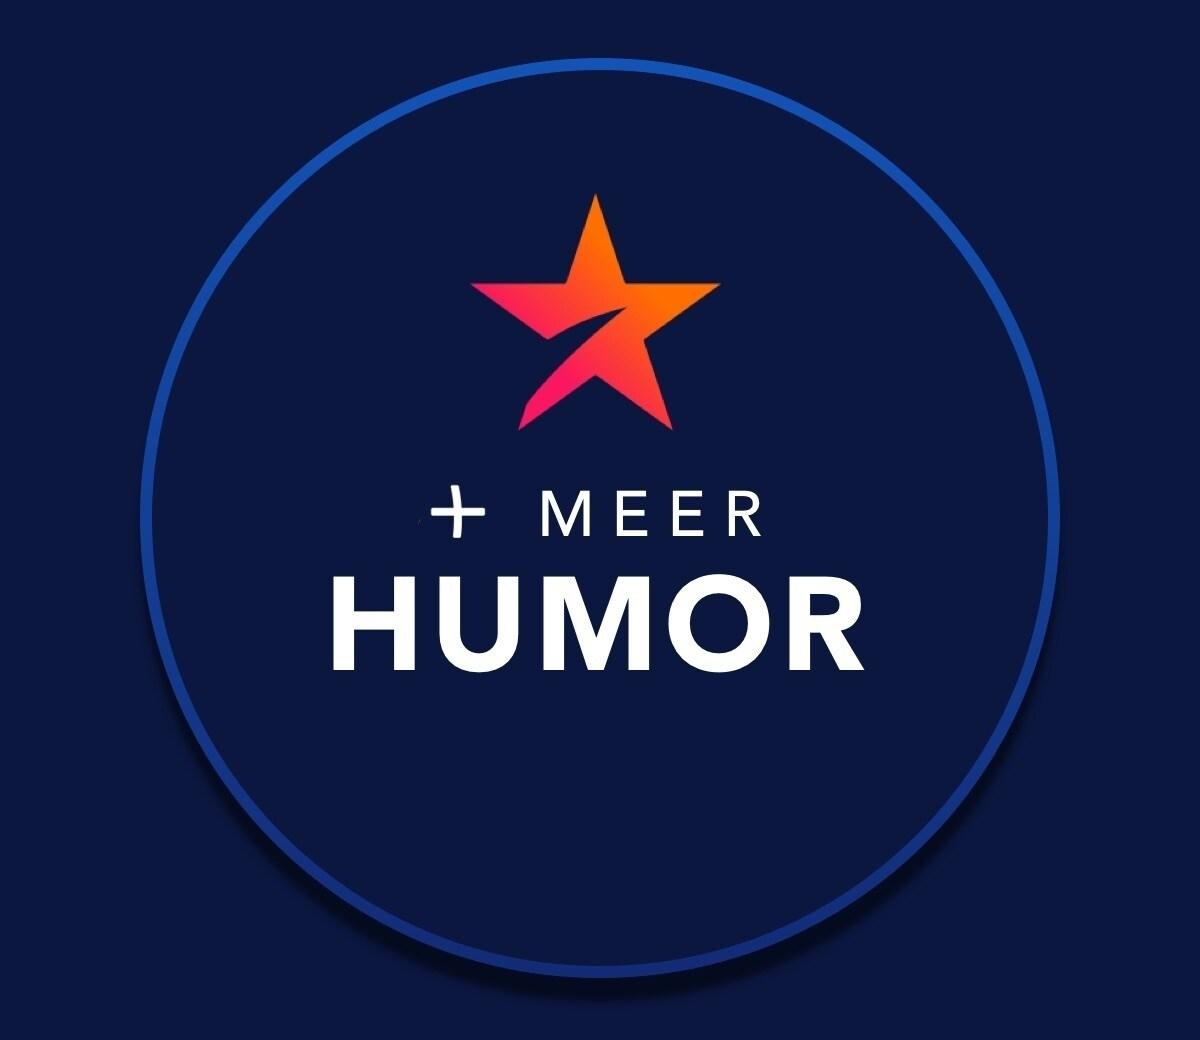 + Meer humor